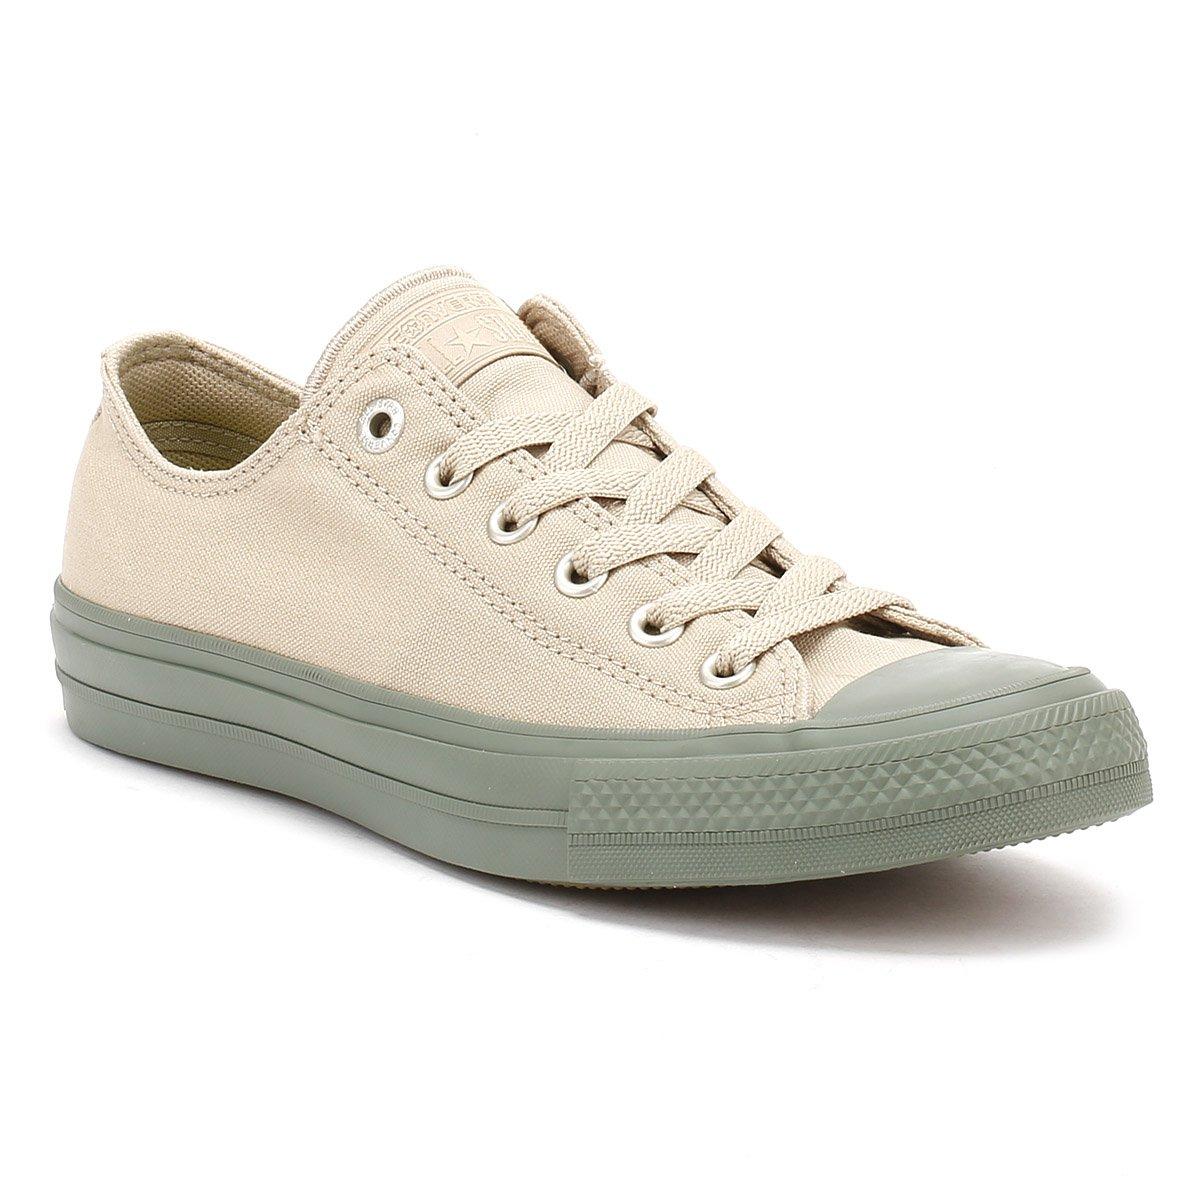 Converse Sneaker, Unisex-Erwachsene All Star Ii Sneaker, Converse Mehrfarbig (Vintage Khaki/Olive Submarine/Gum) ceeddb